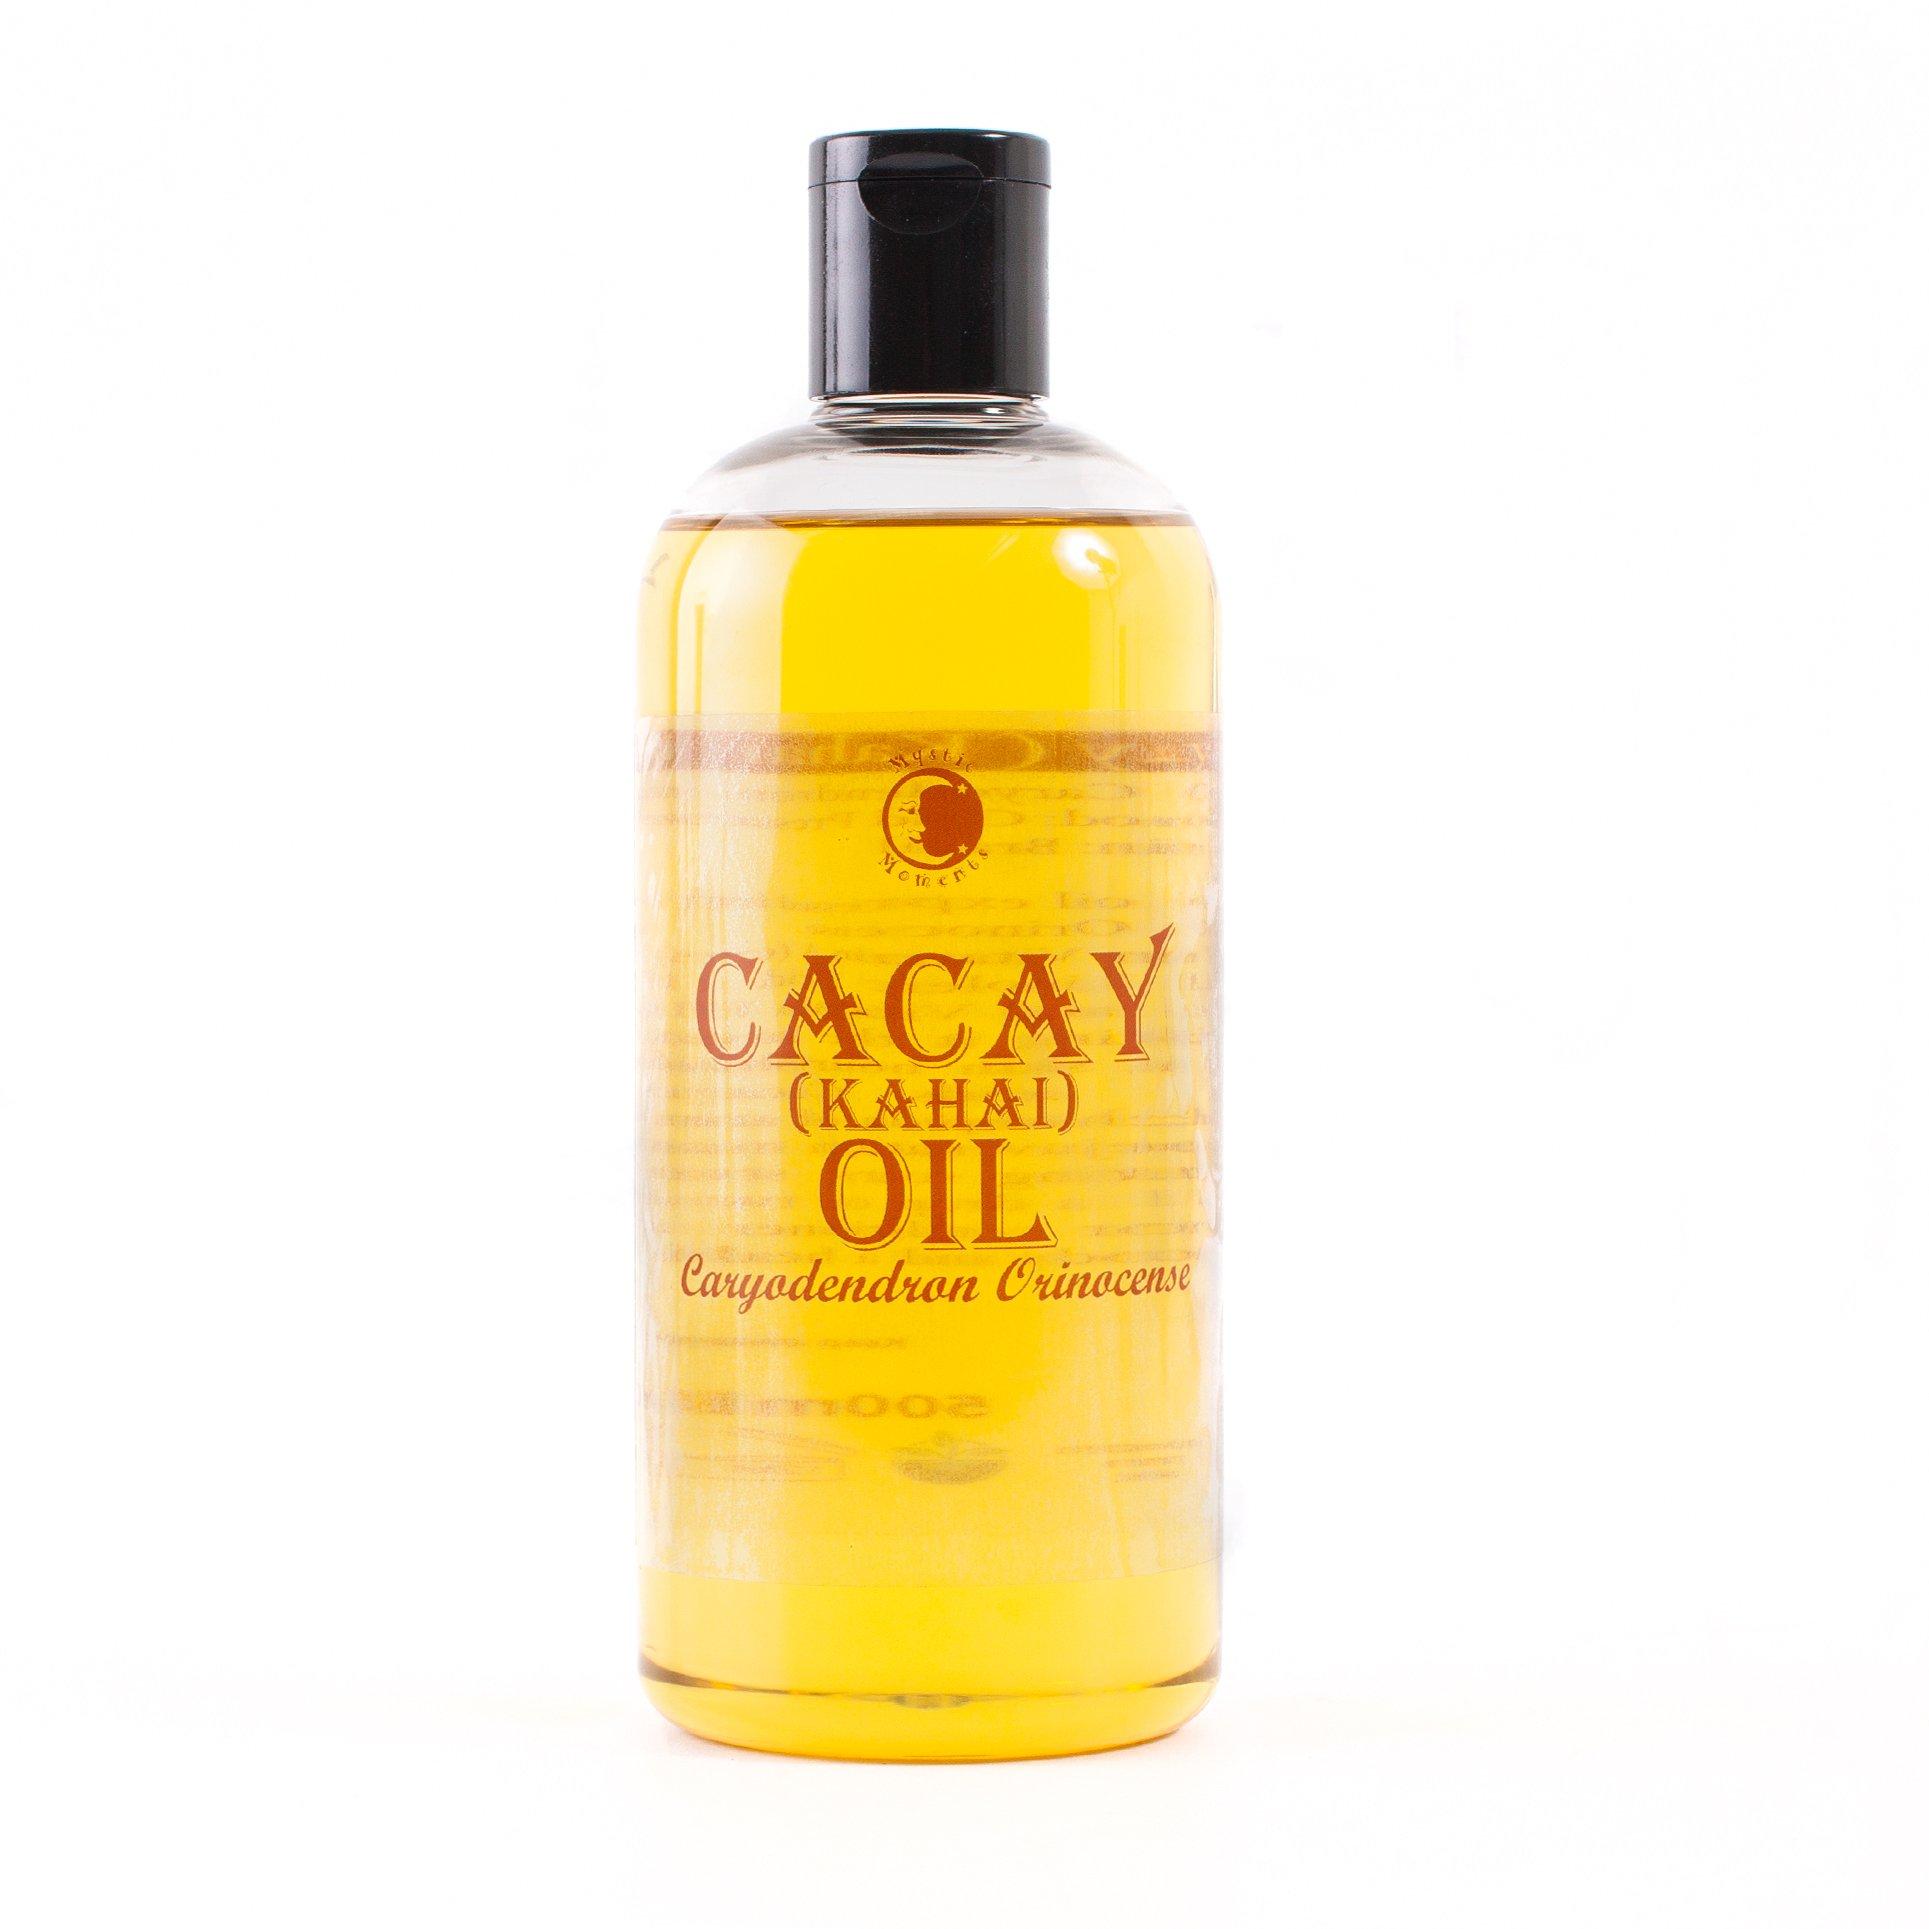 Mystic Moments   Cacay (Kahai) Carrier Oil - 1 Litre - 100% Pure